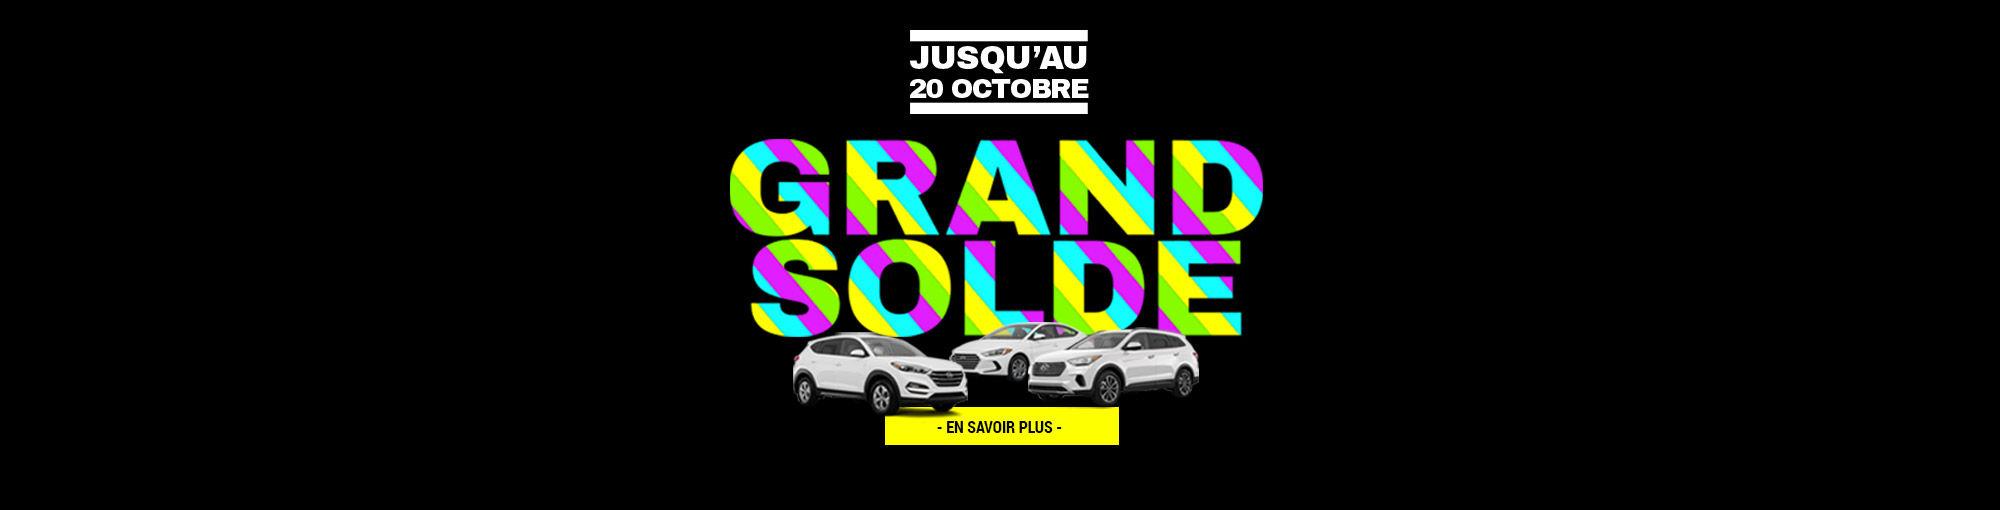 GRAND SOLDE automne 2018 GROUPE VINCENT header Hyundai Shawinigan_1